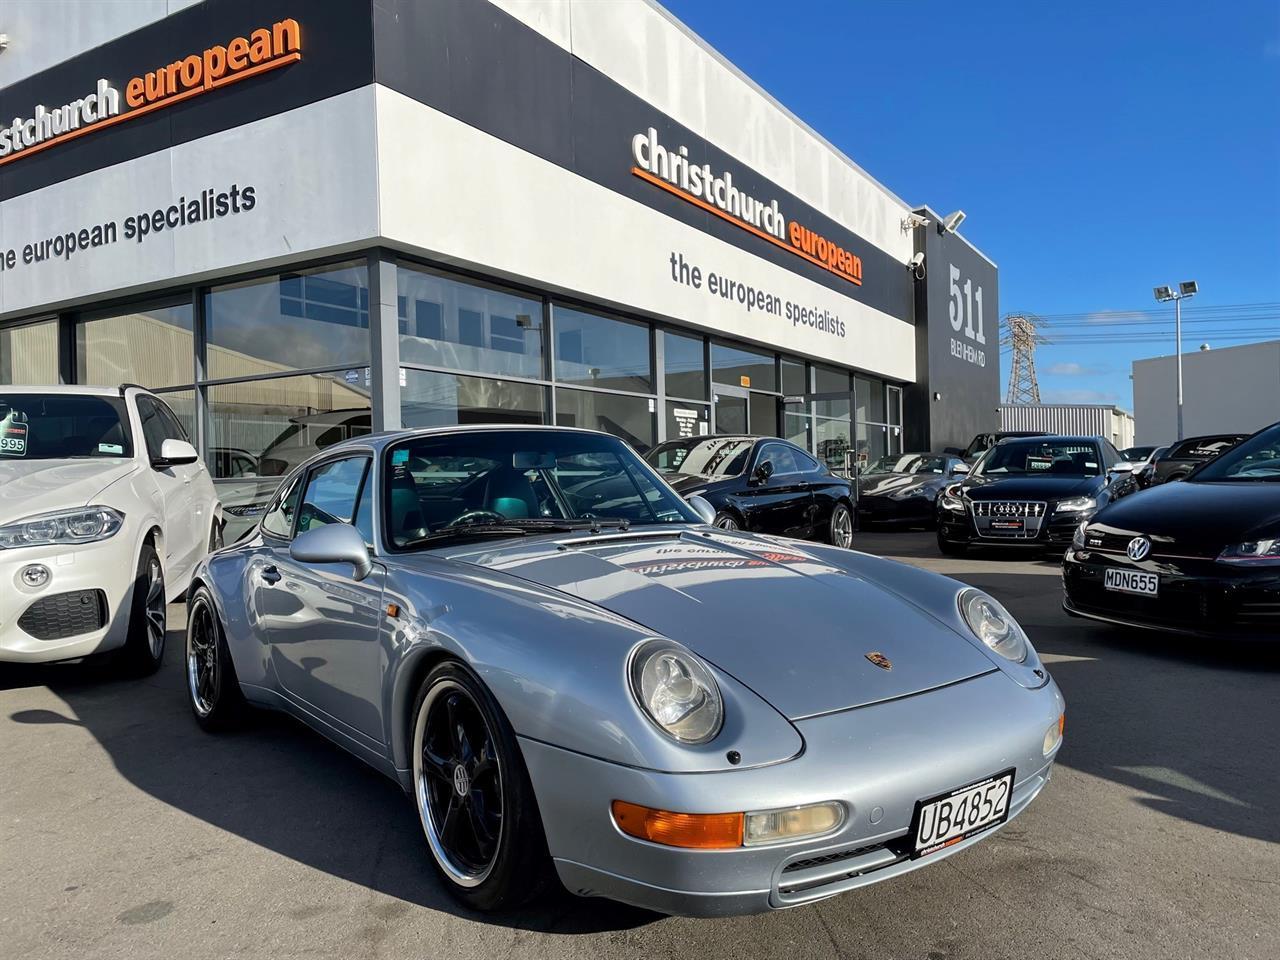 image-1, 1996 Porsche 911 993 Carrera 2 at Christchurch